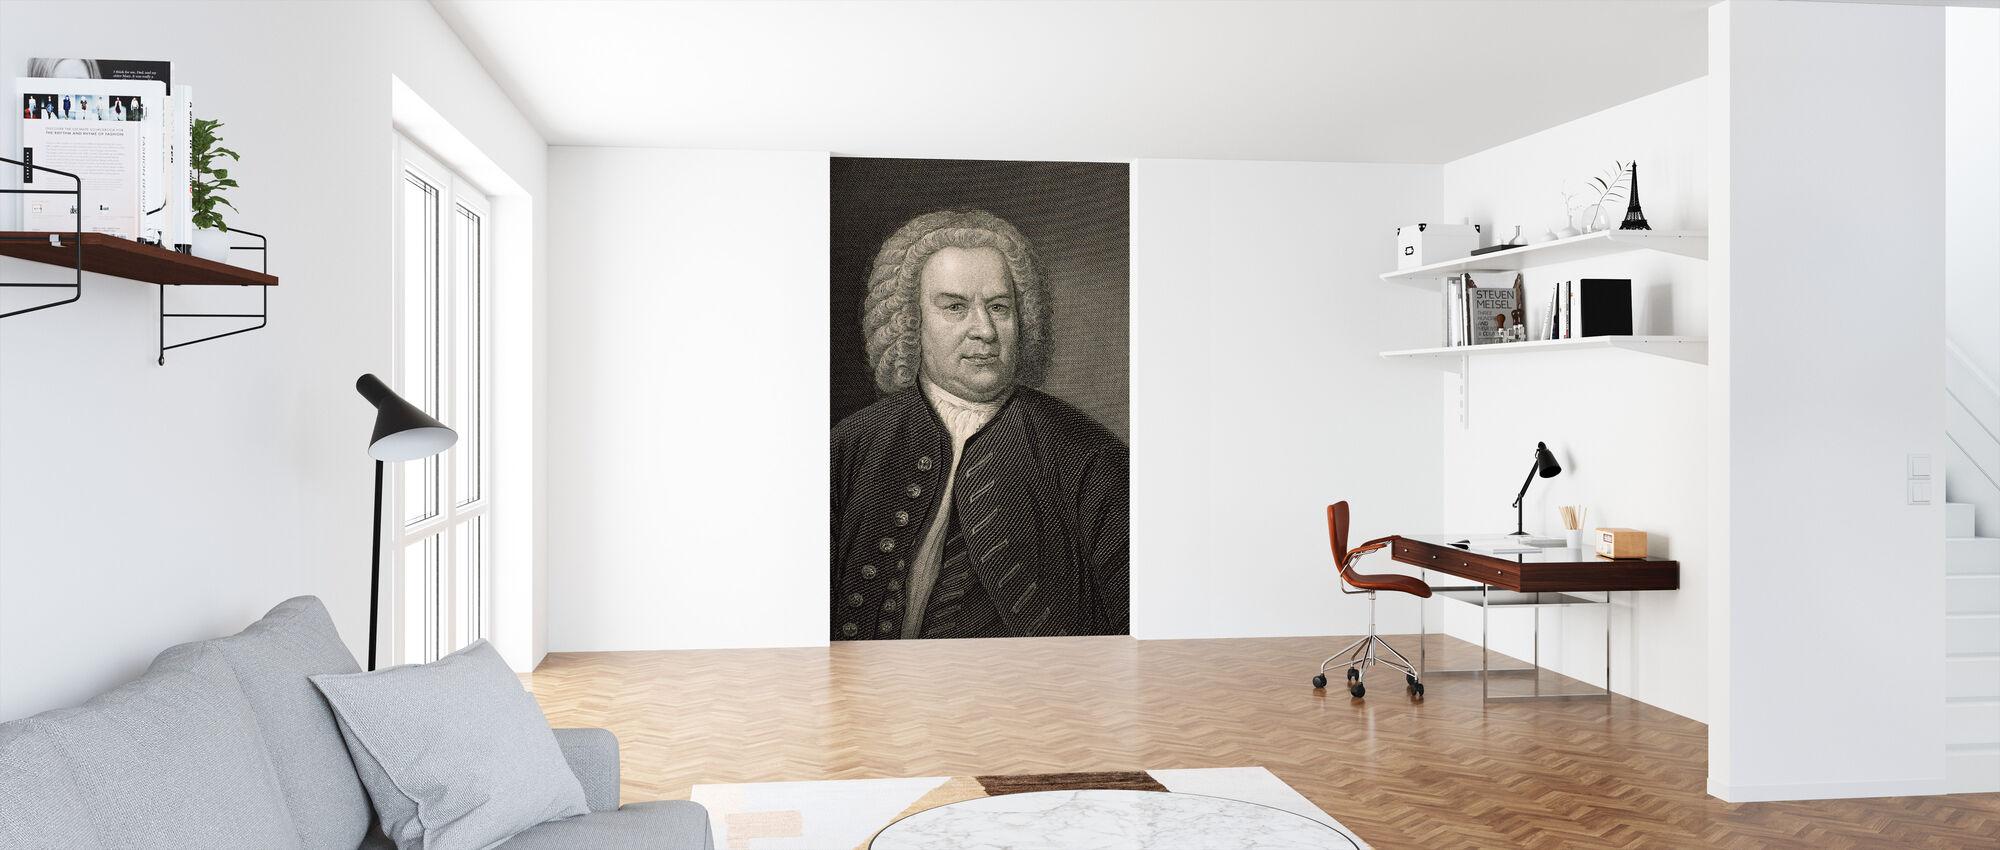 Johann Sebastian Bach - Wallpaper - Office